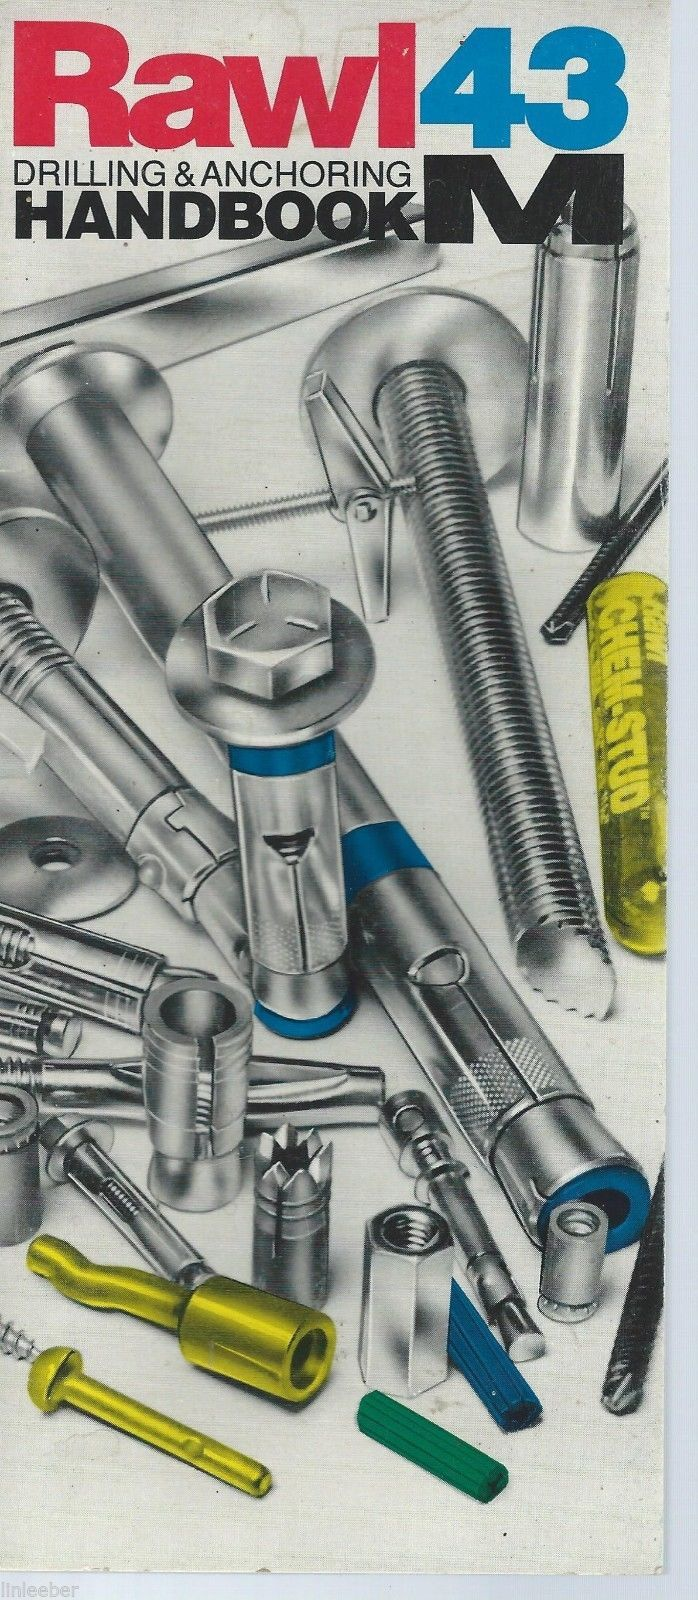 Rawl Products Drilling&Anchoring Handbook 43M; 1990;Illus.Anchor Selection Guide